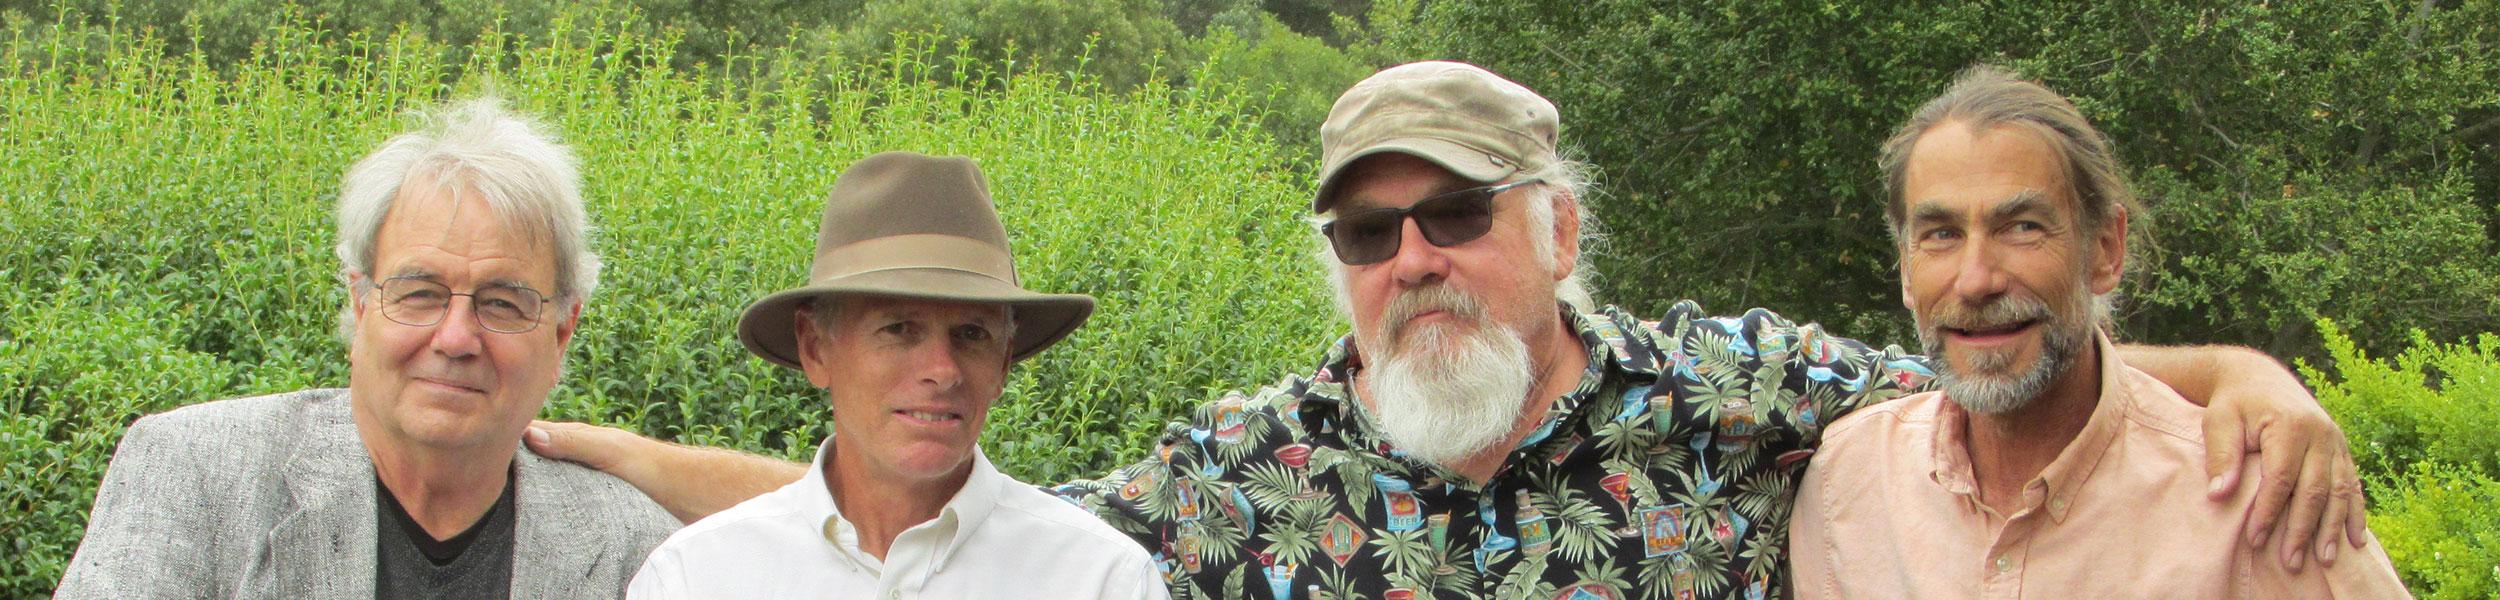 Humboldt Botanical Garden Summer Music Series- The Low Notes